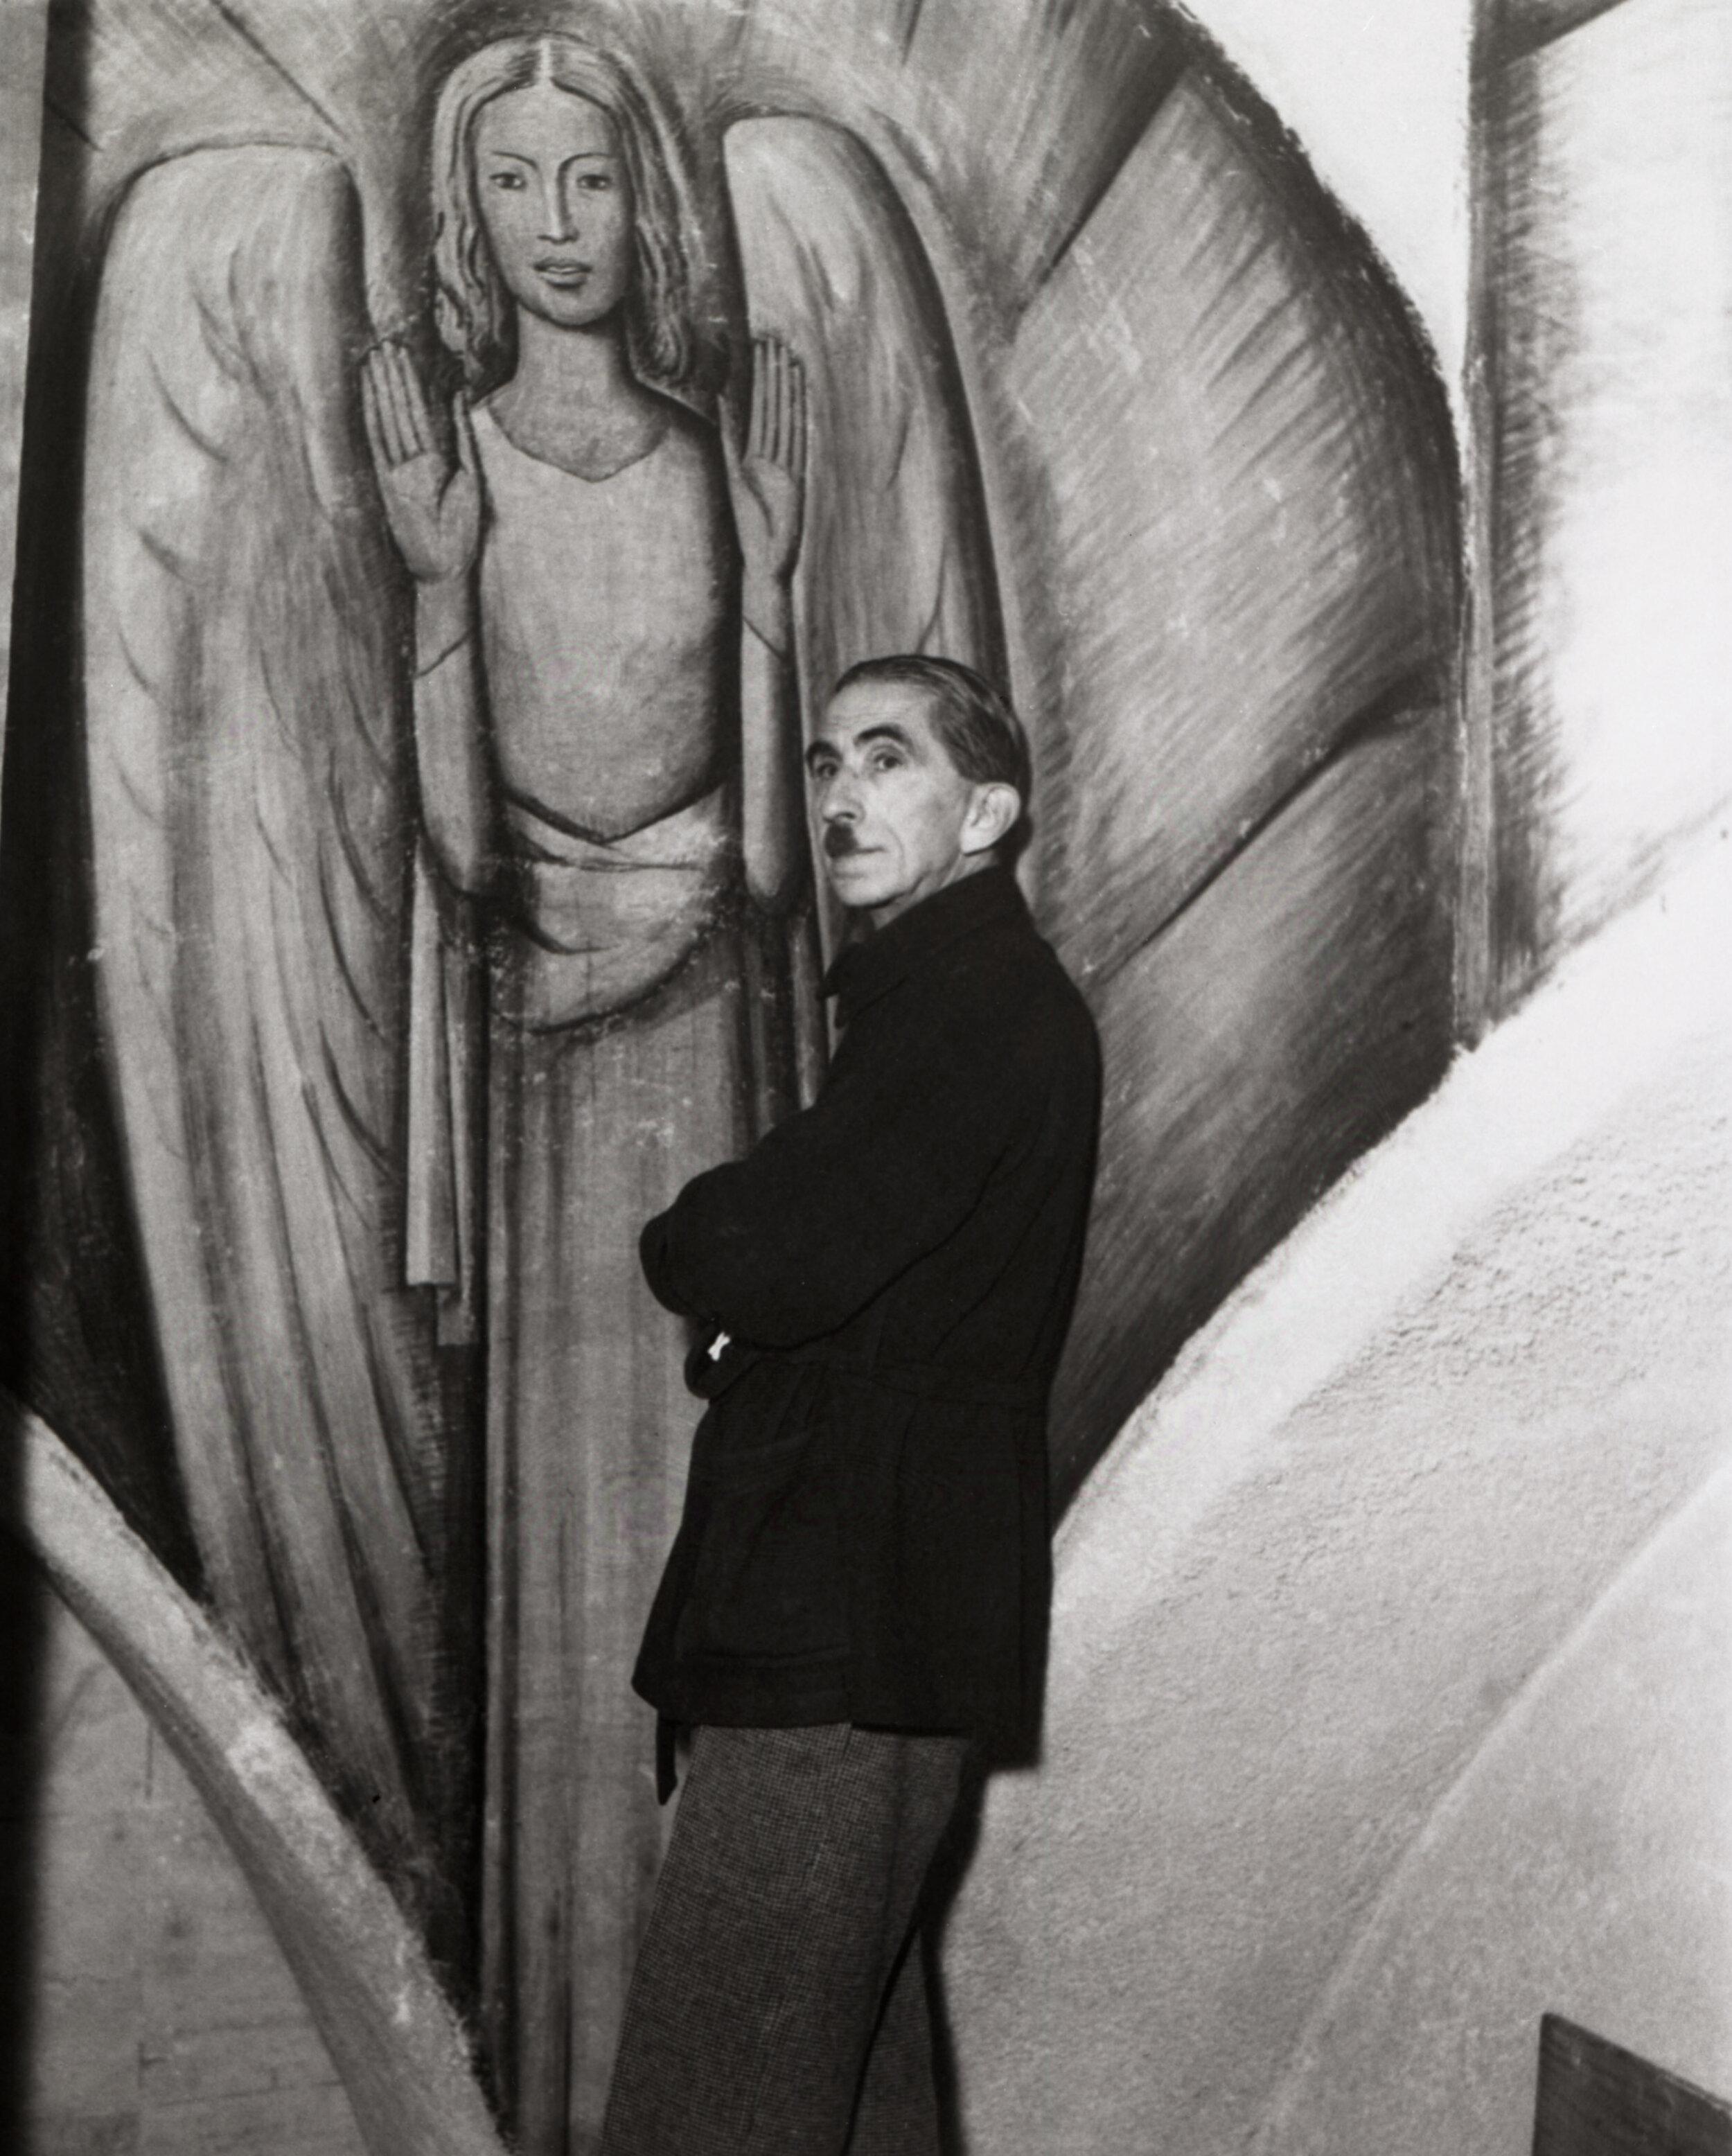 Alfredo ramos Martinez painting in the Chapel of the Santa Barbara Cemetery, 1934